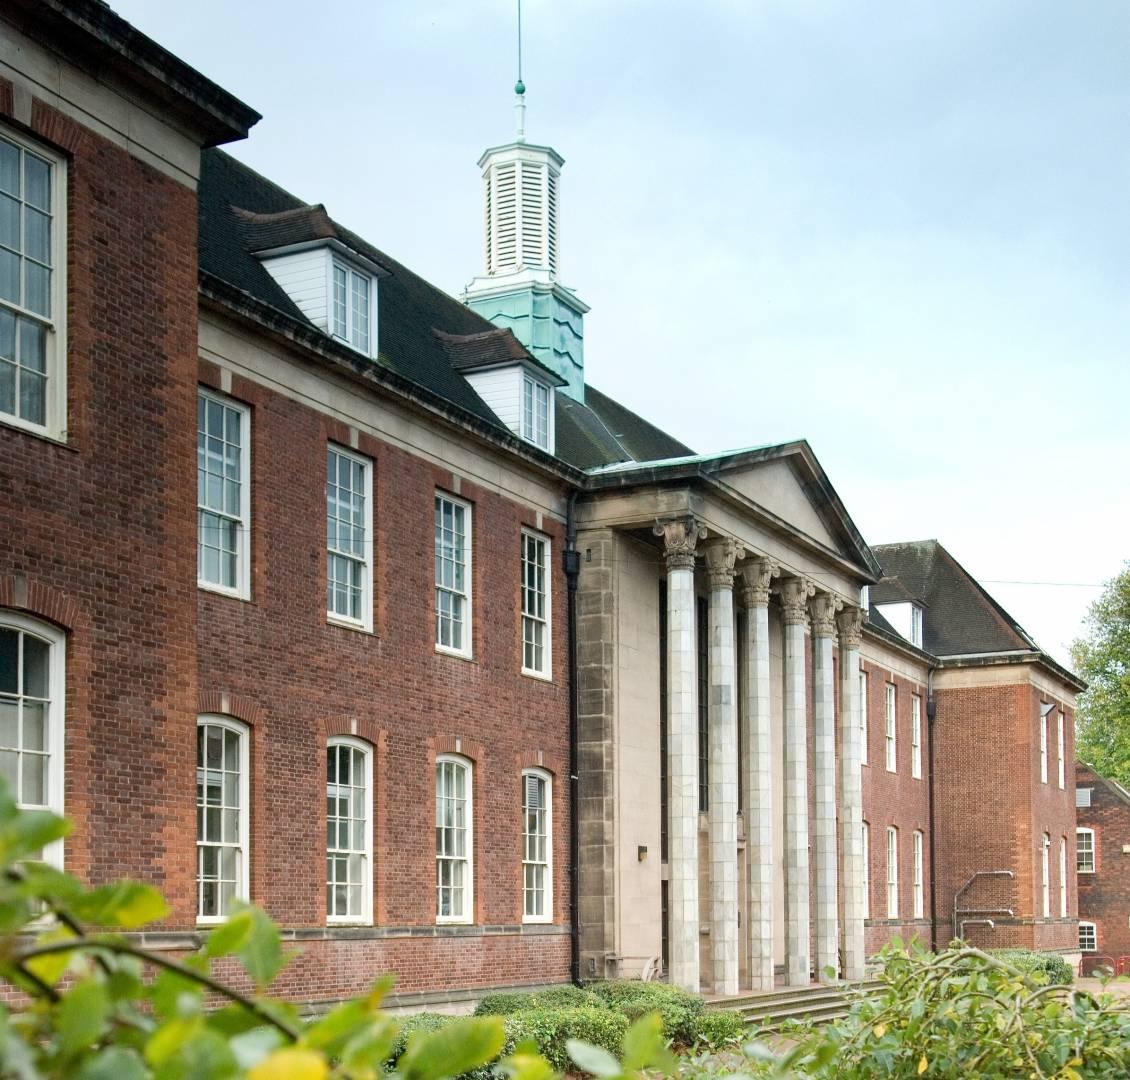 Lucideon's Stoke-on-Trent HQ